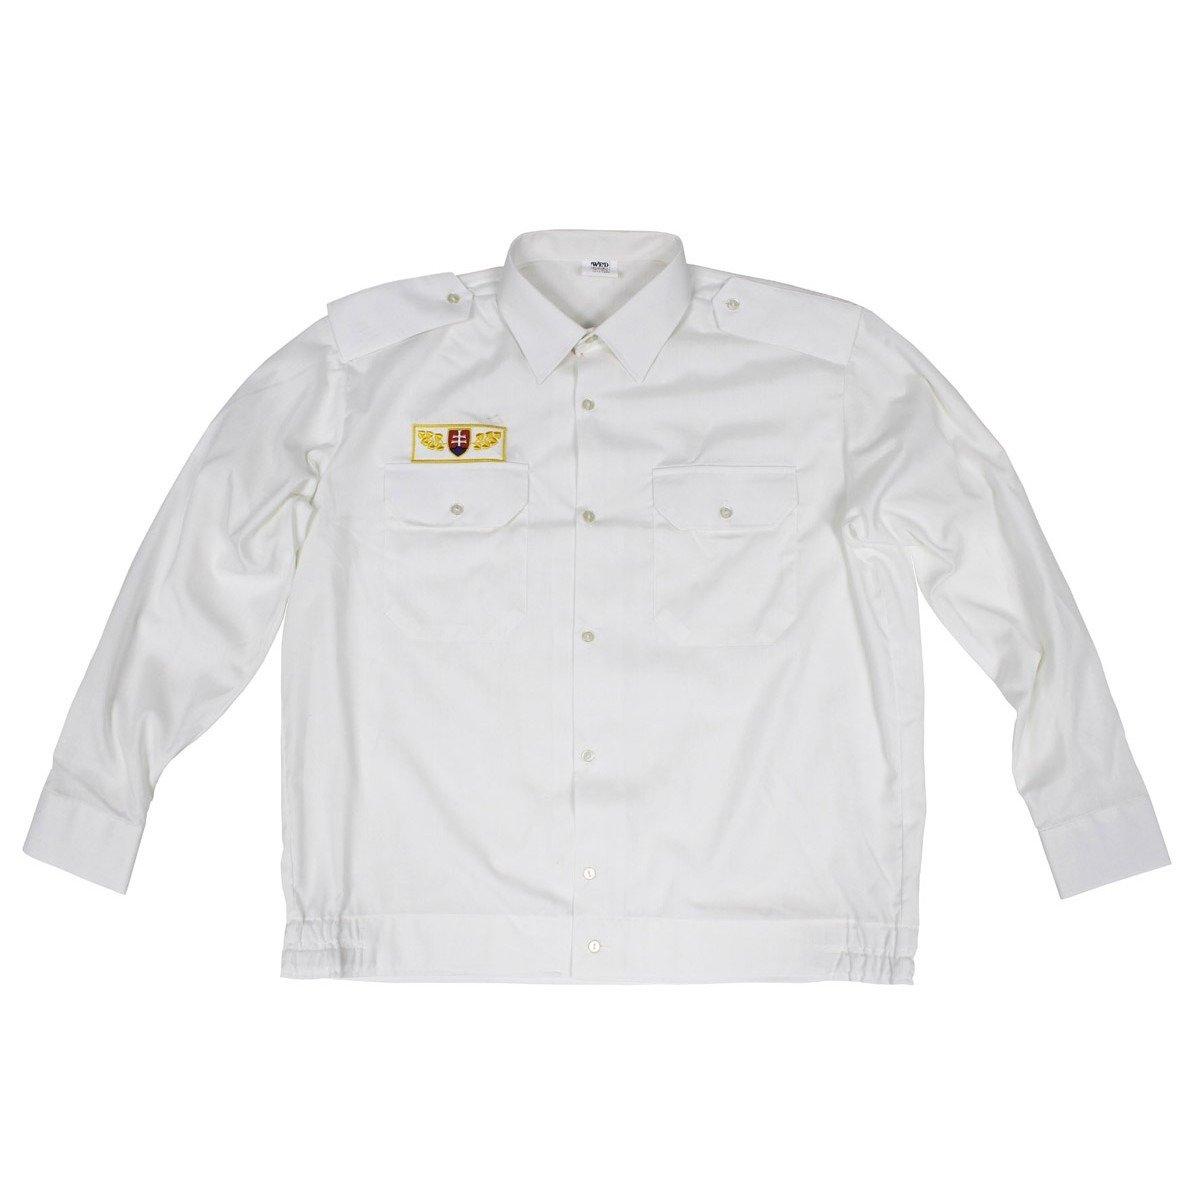 Sk shirt white like new military surplus used for White military dress shirt